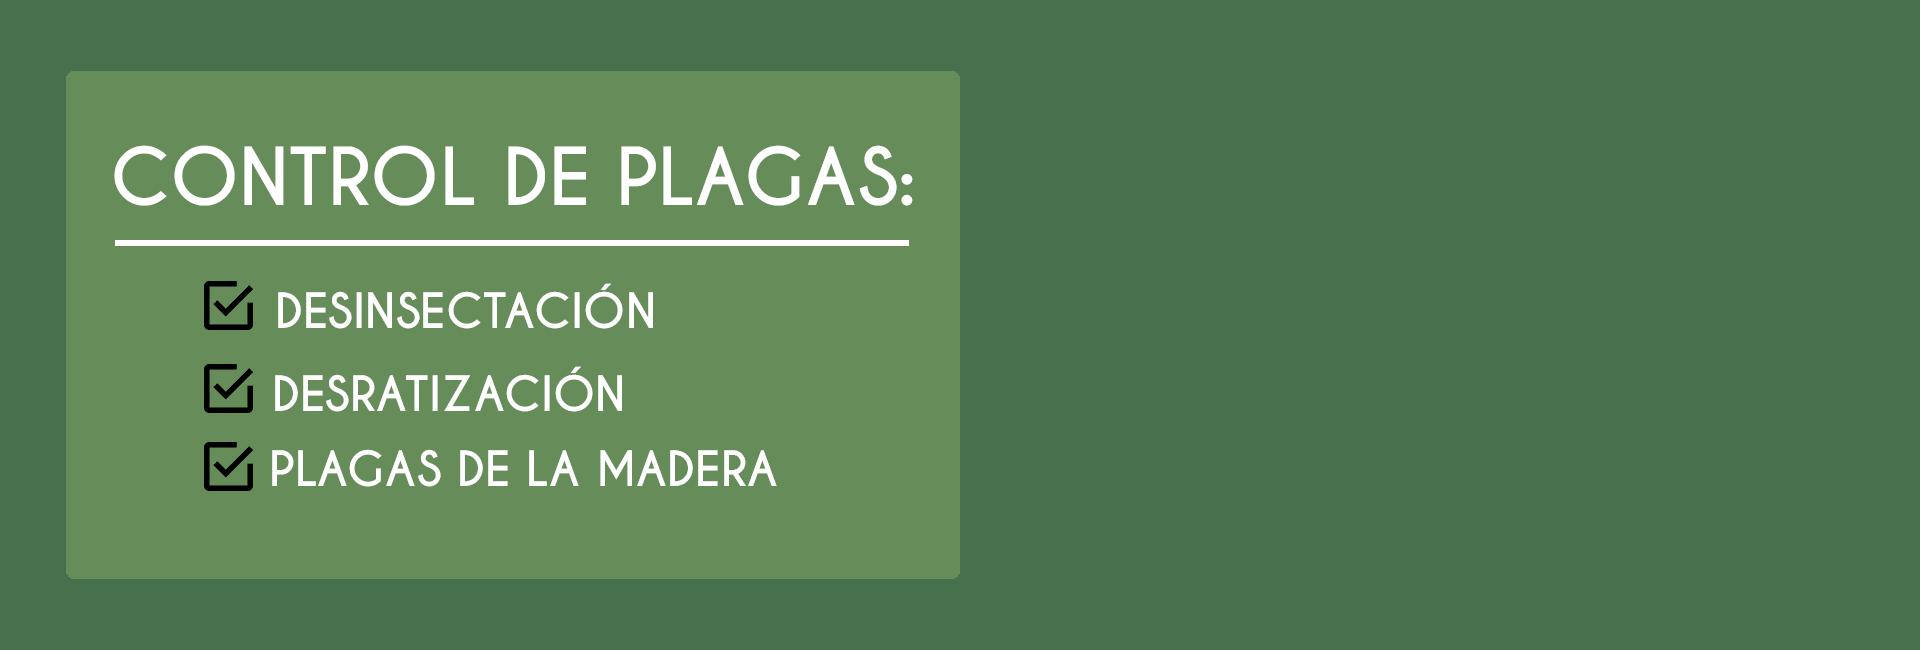 control de plagas en malaga ambiplaga